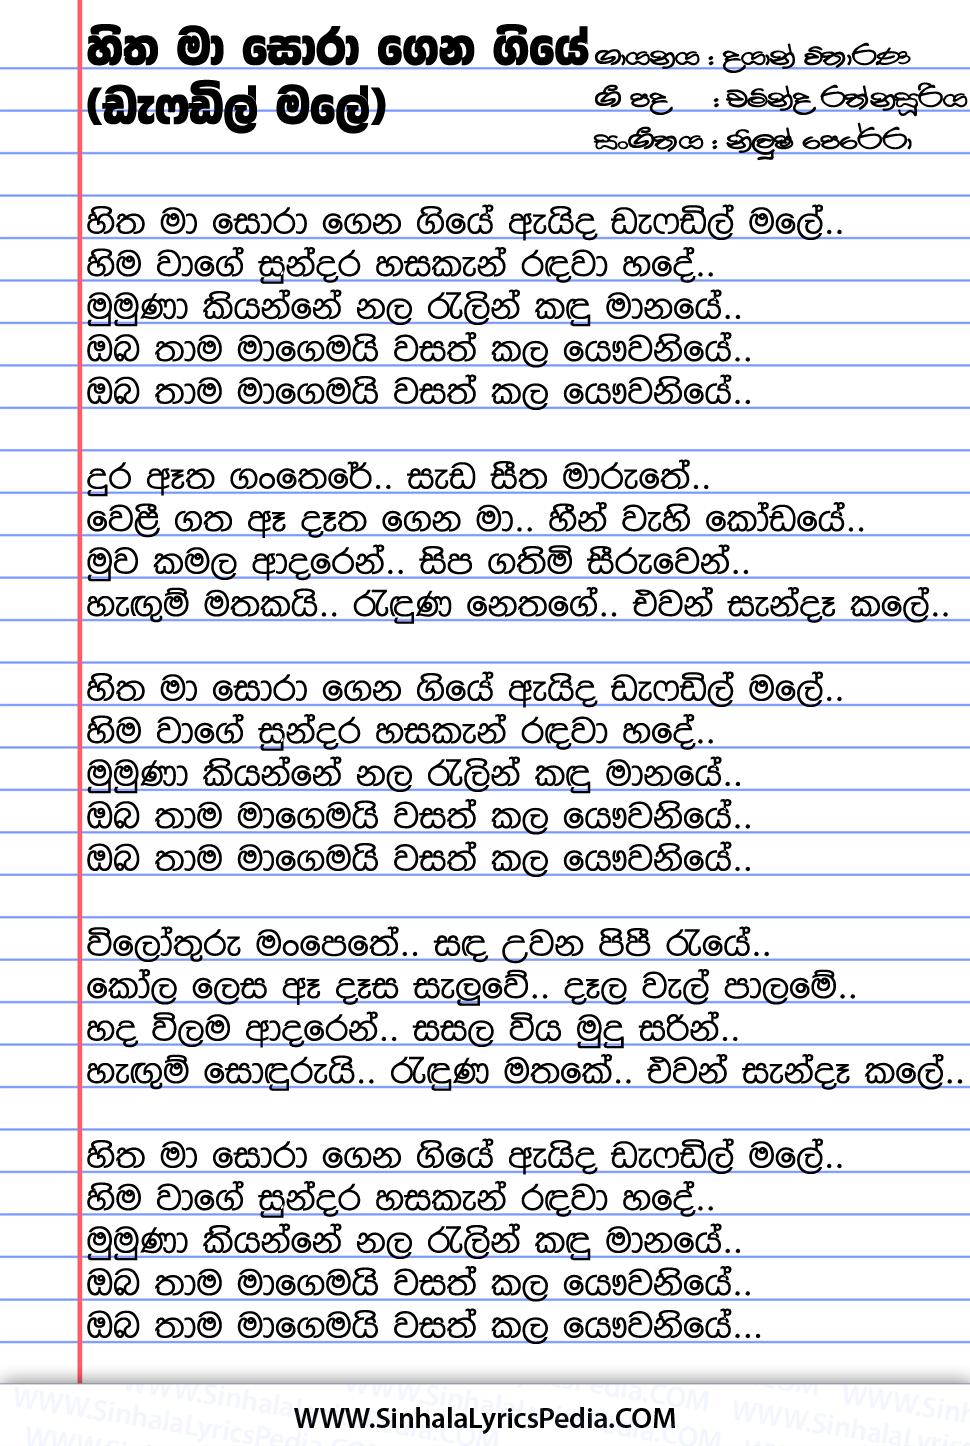 Sitha Ma Soragena Giye (Daffodil Male) Song Lyrics